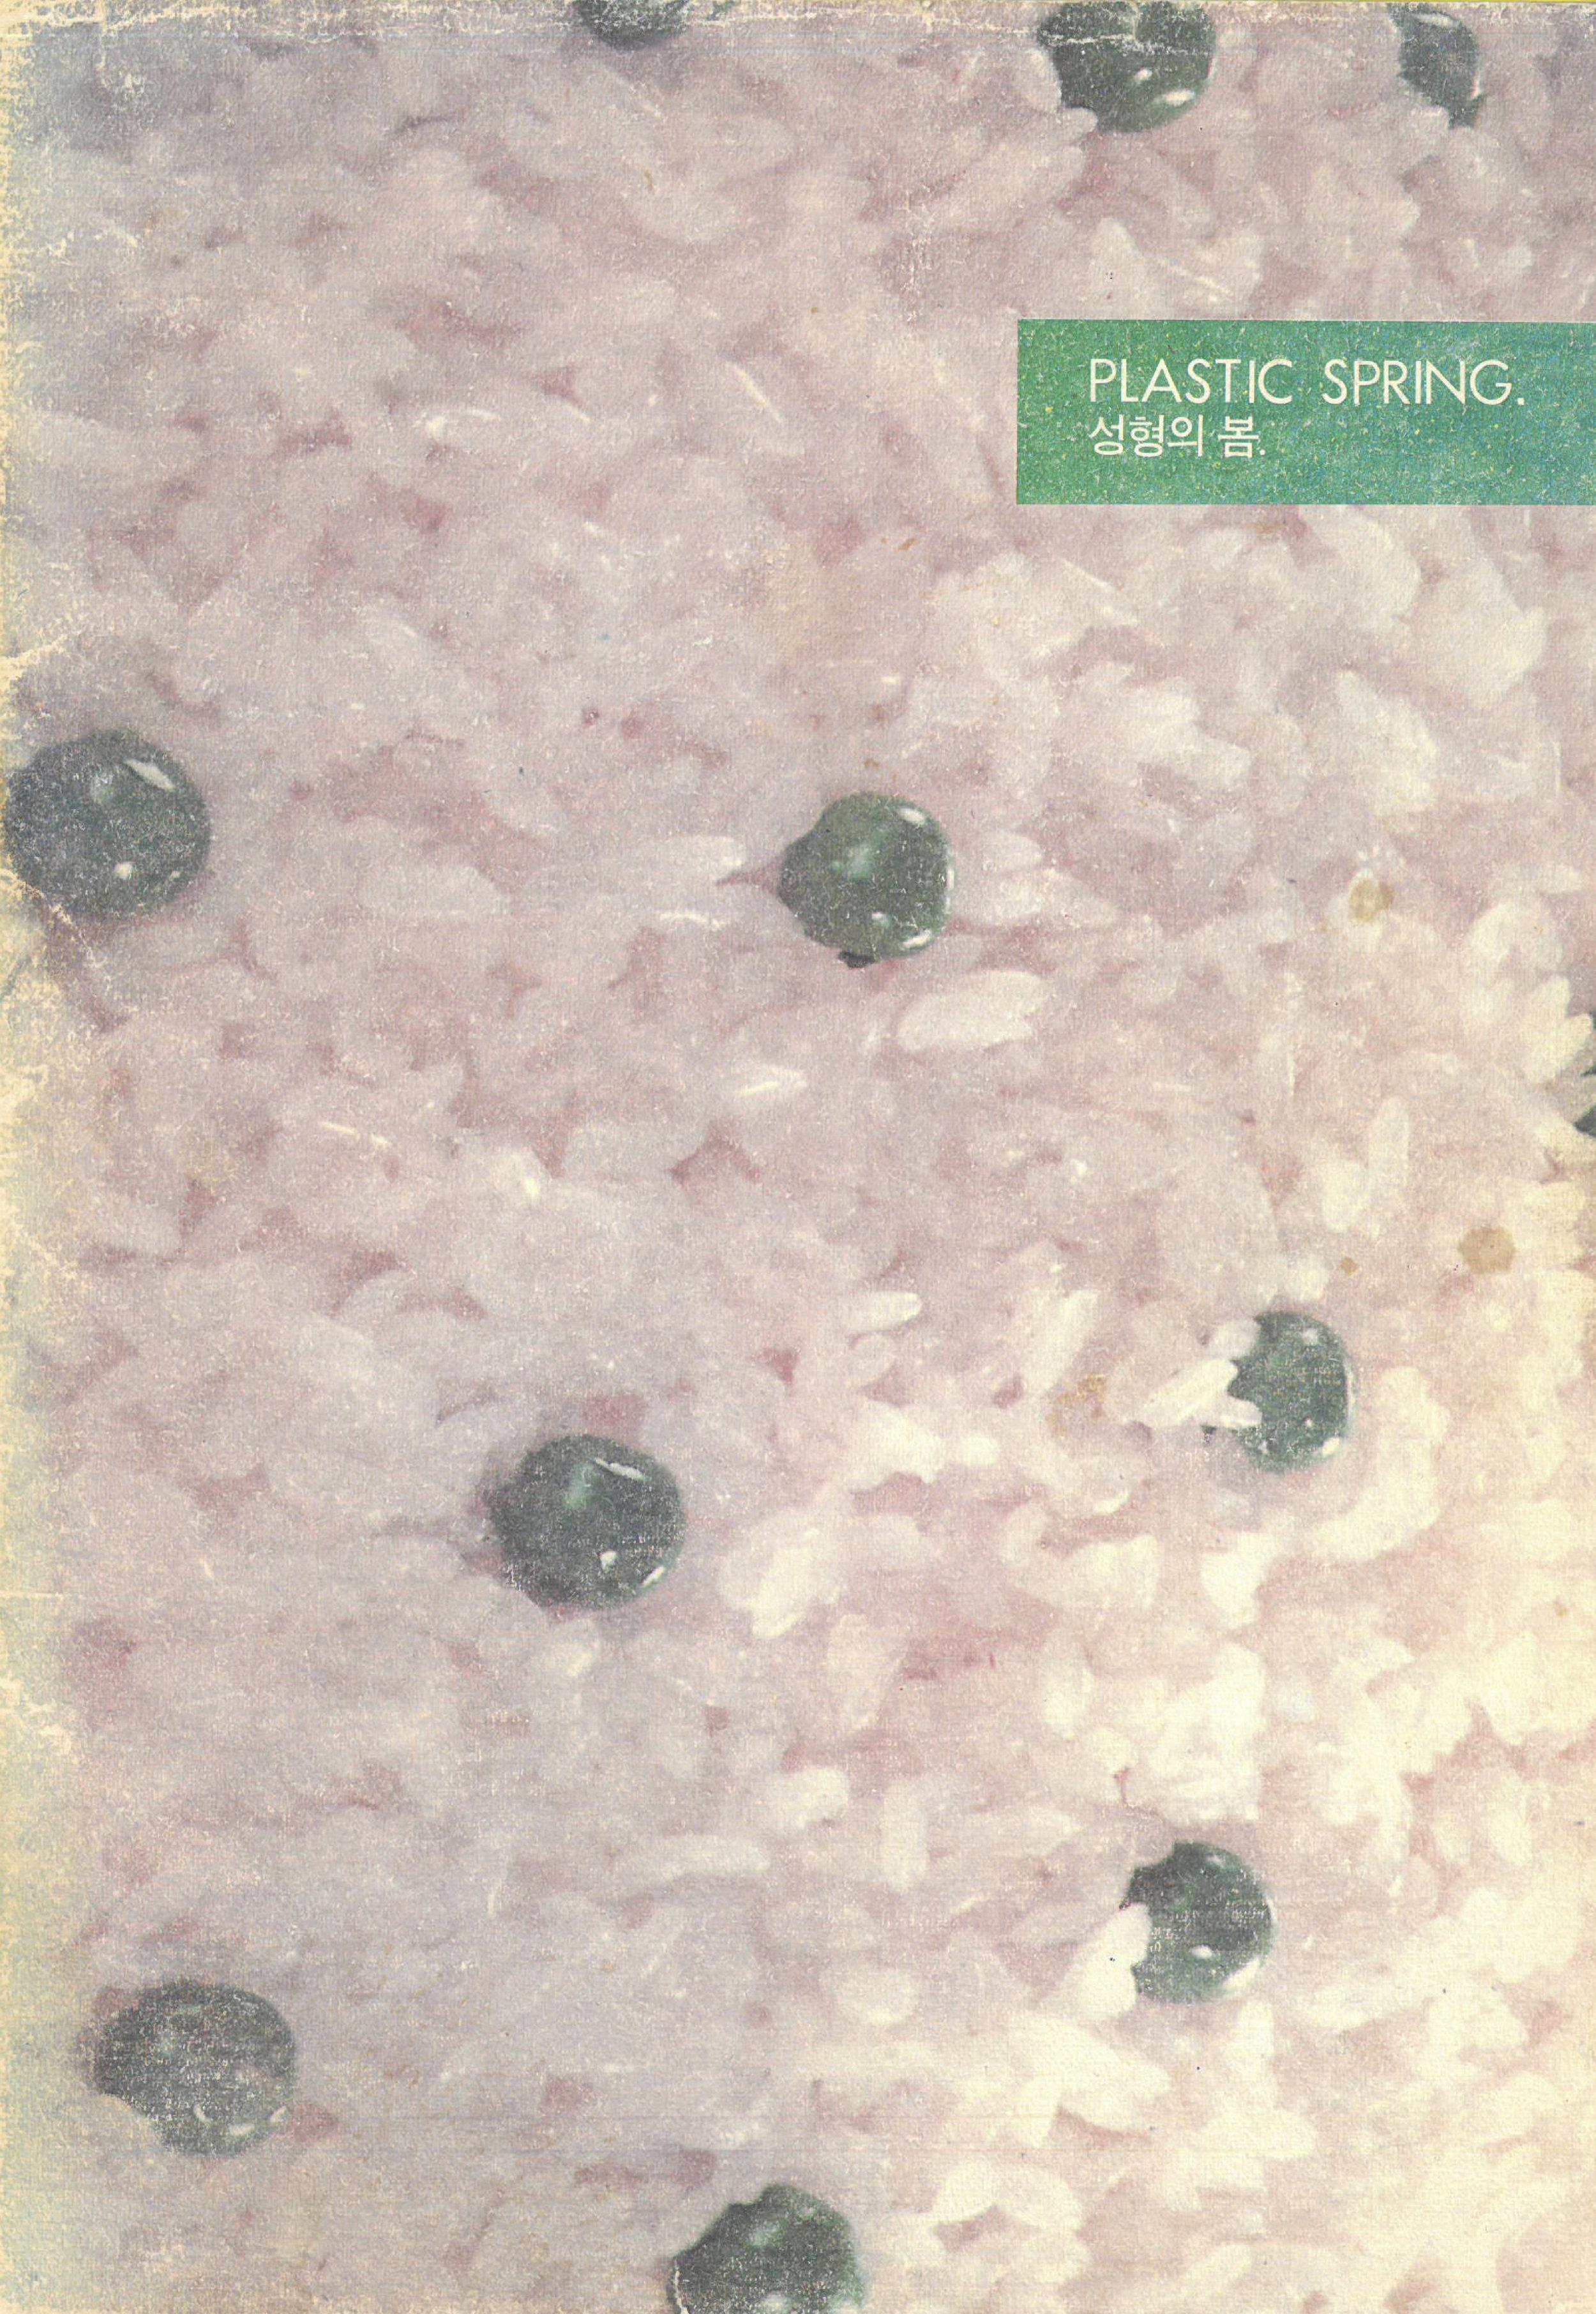 Plastic Spring1.jpg